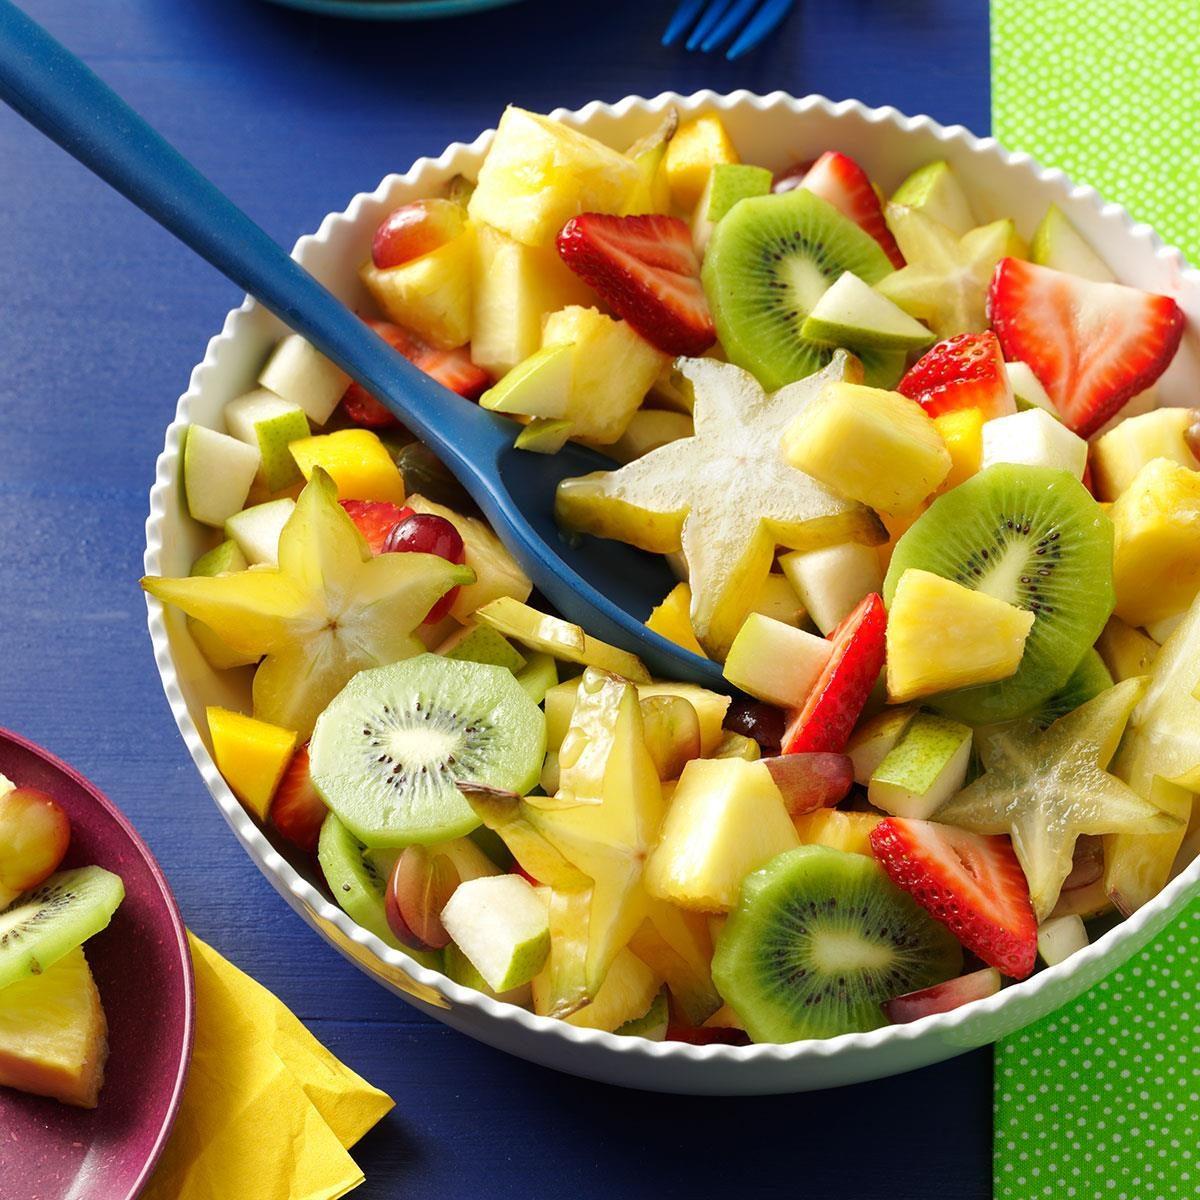 картинки для нарезки фруктов с рецептами оперение, простота